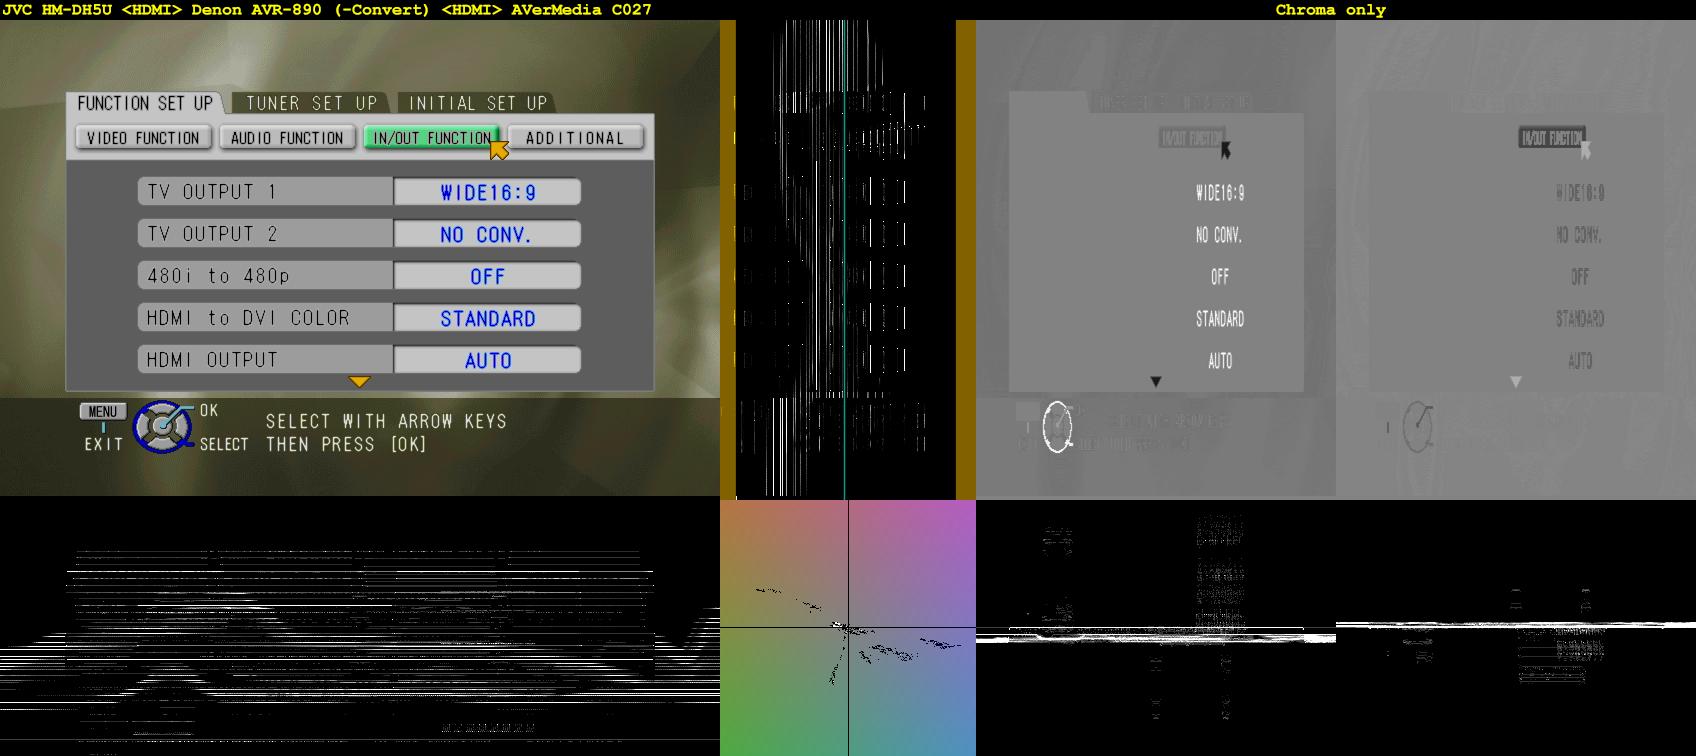 Click image for larger version  Name:Menu - JVC HM-DH5U =HDMI= Denon AVR-890, -Convert =HDMI= AVerMedia C027.png Views:3095 Size:395.6 KB ID:35275